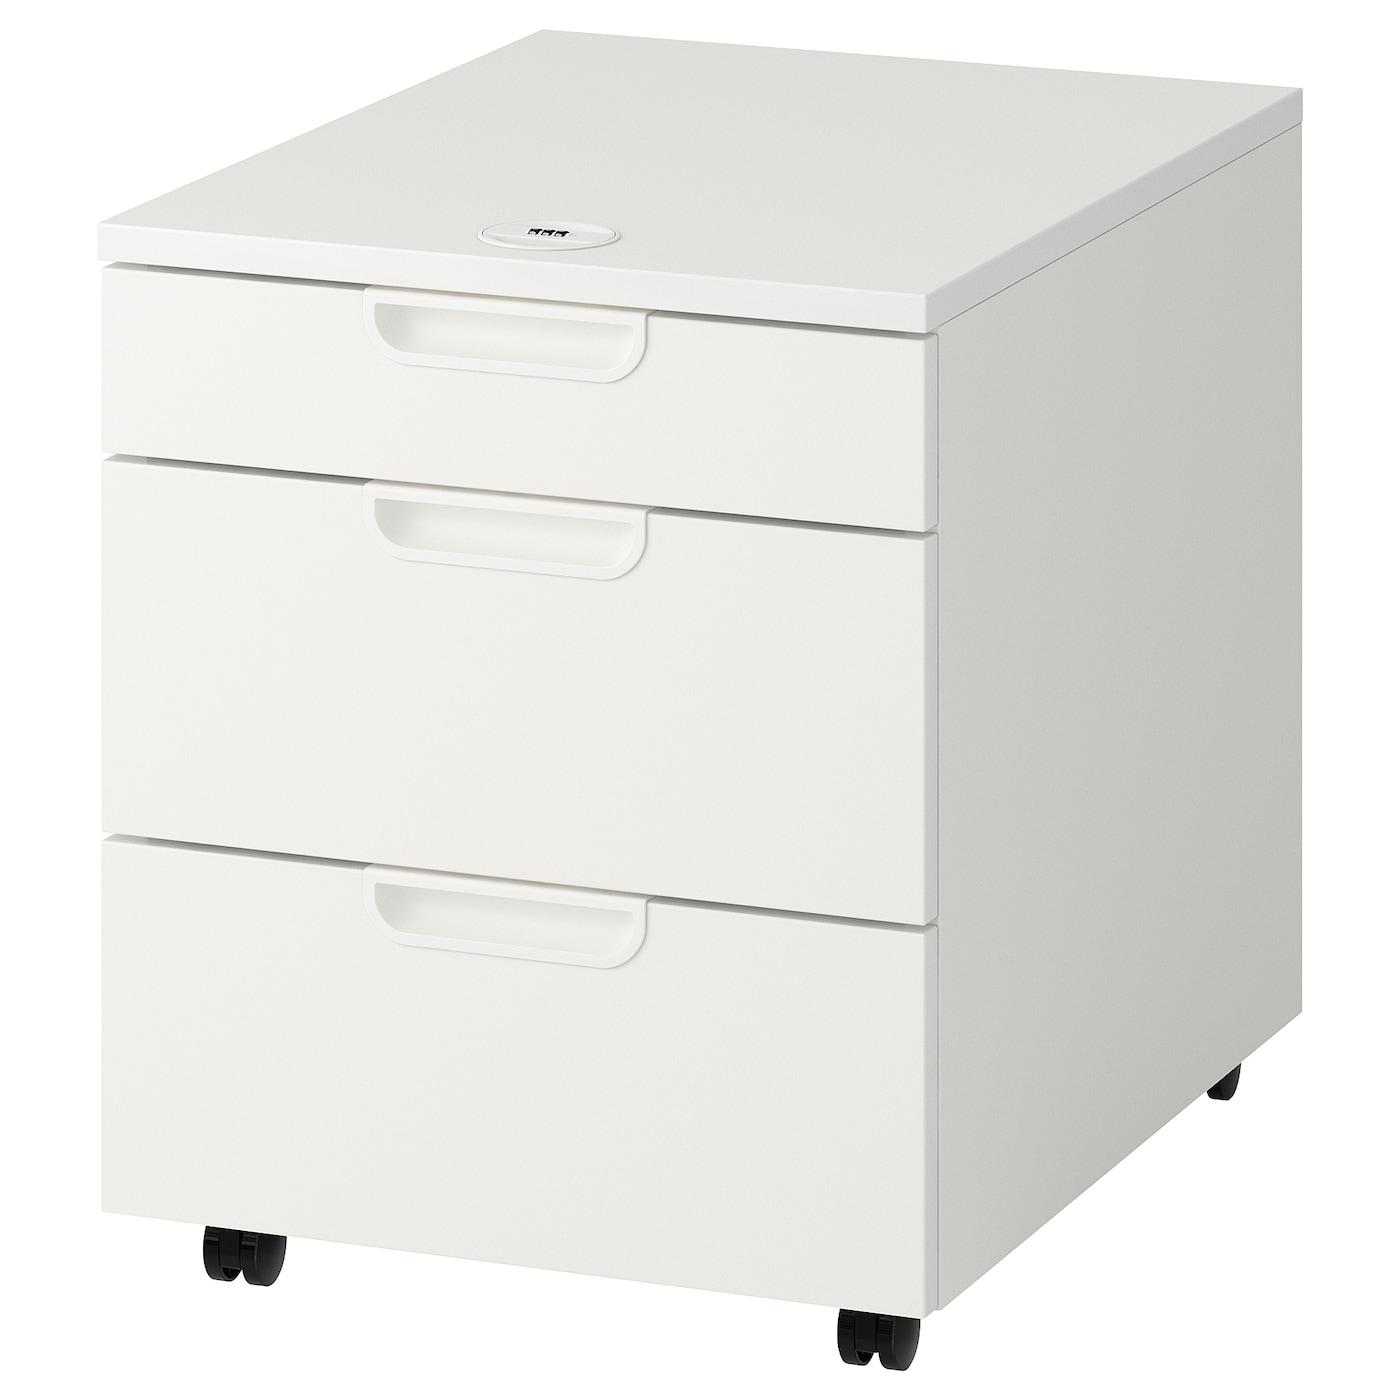 ikea galant file cabinet lock reset